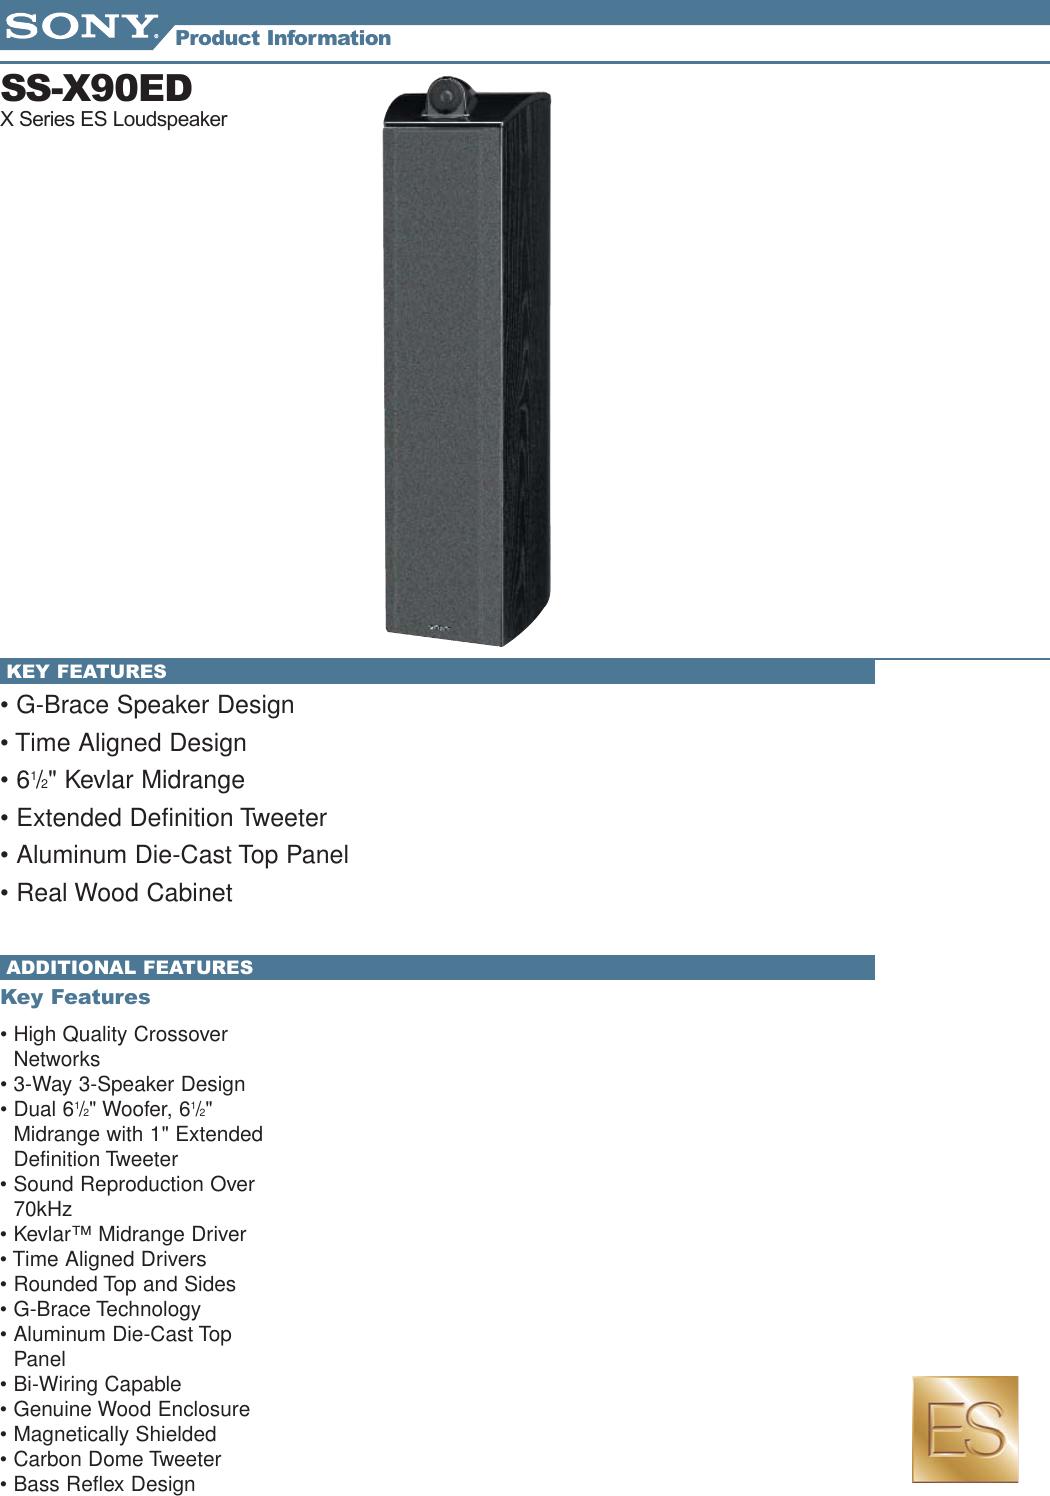 Sony Ss X90ed Speakers Info Sheets 1 User Manual Marketing Bi Wiring Diagram Specifications Ssx90ed Mksp